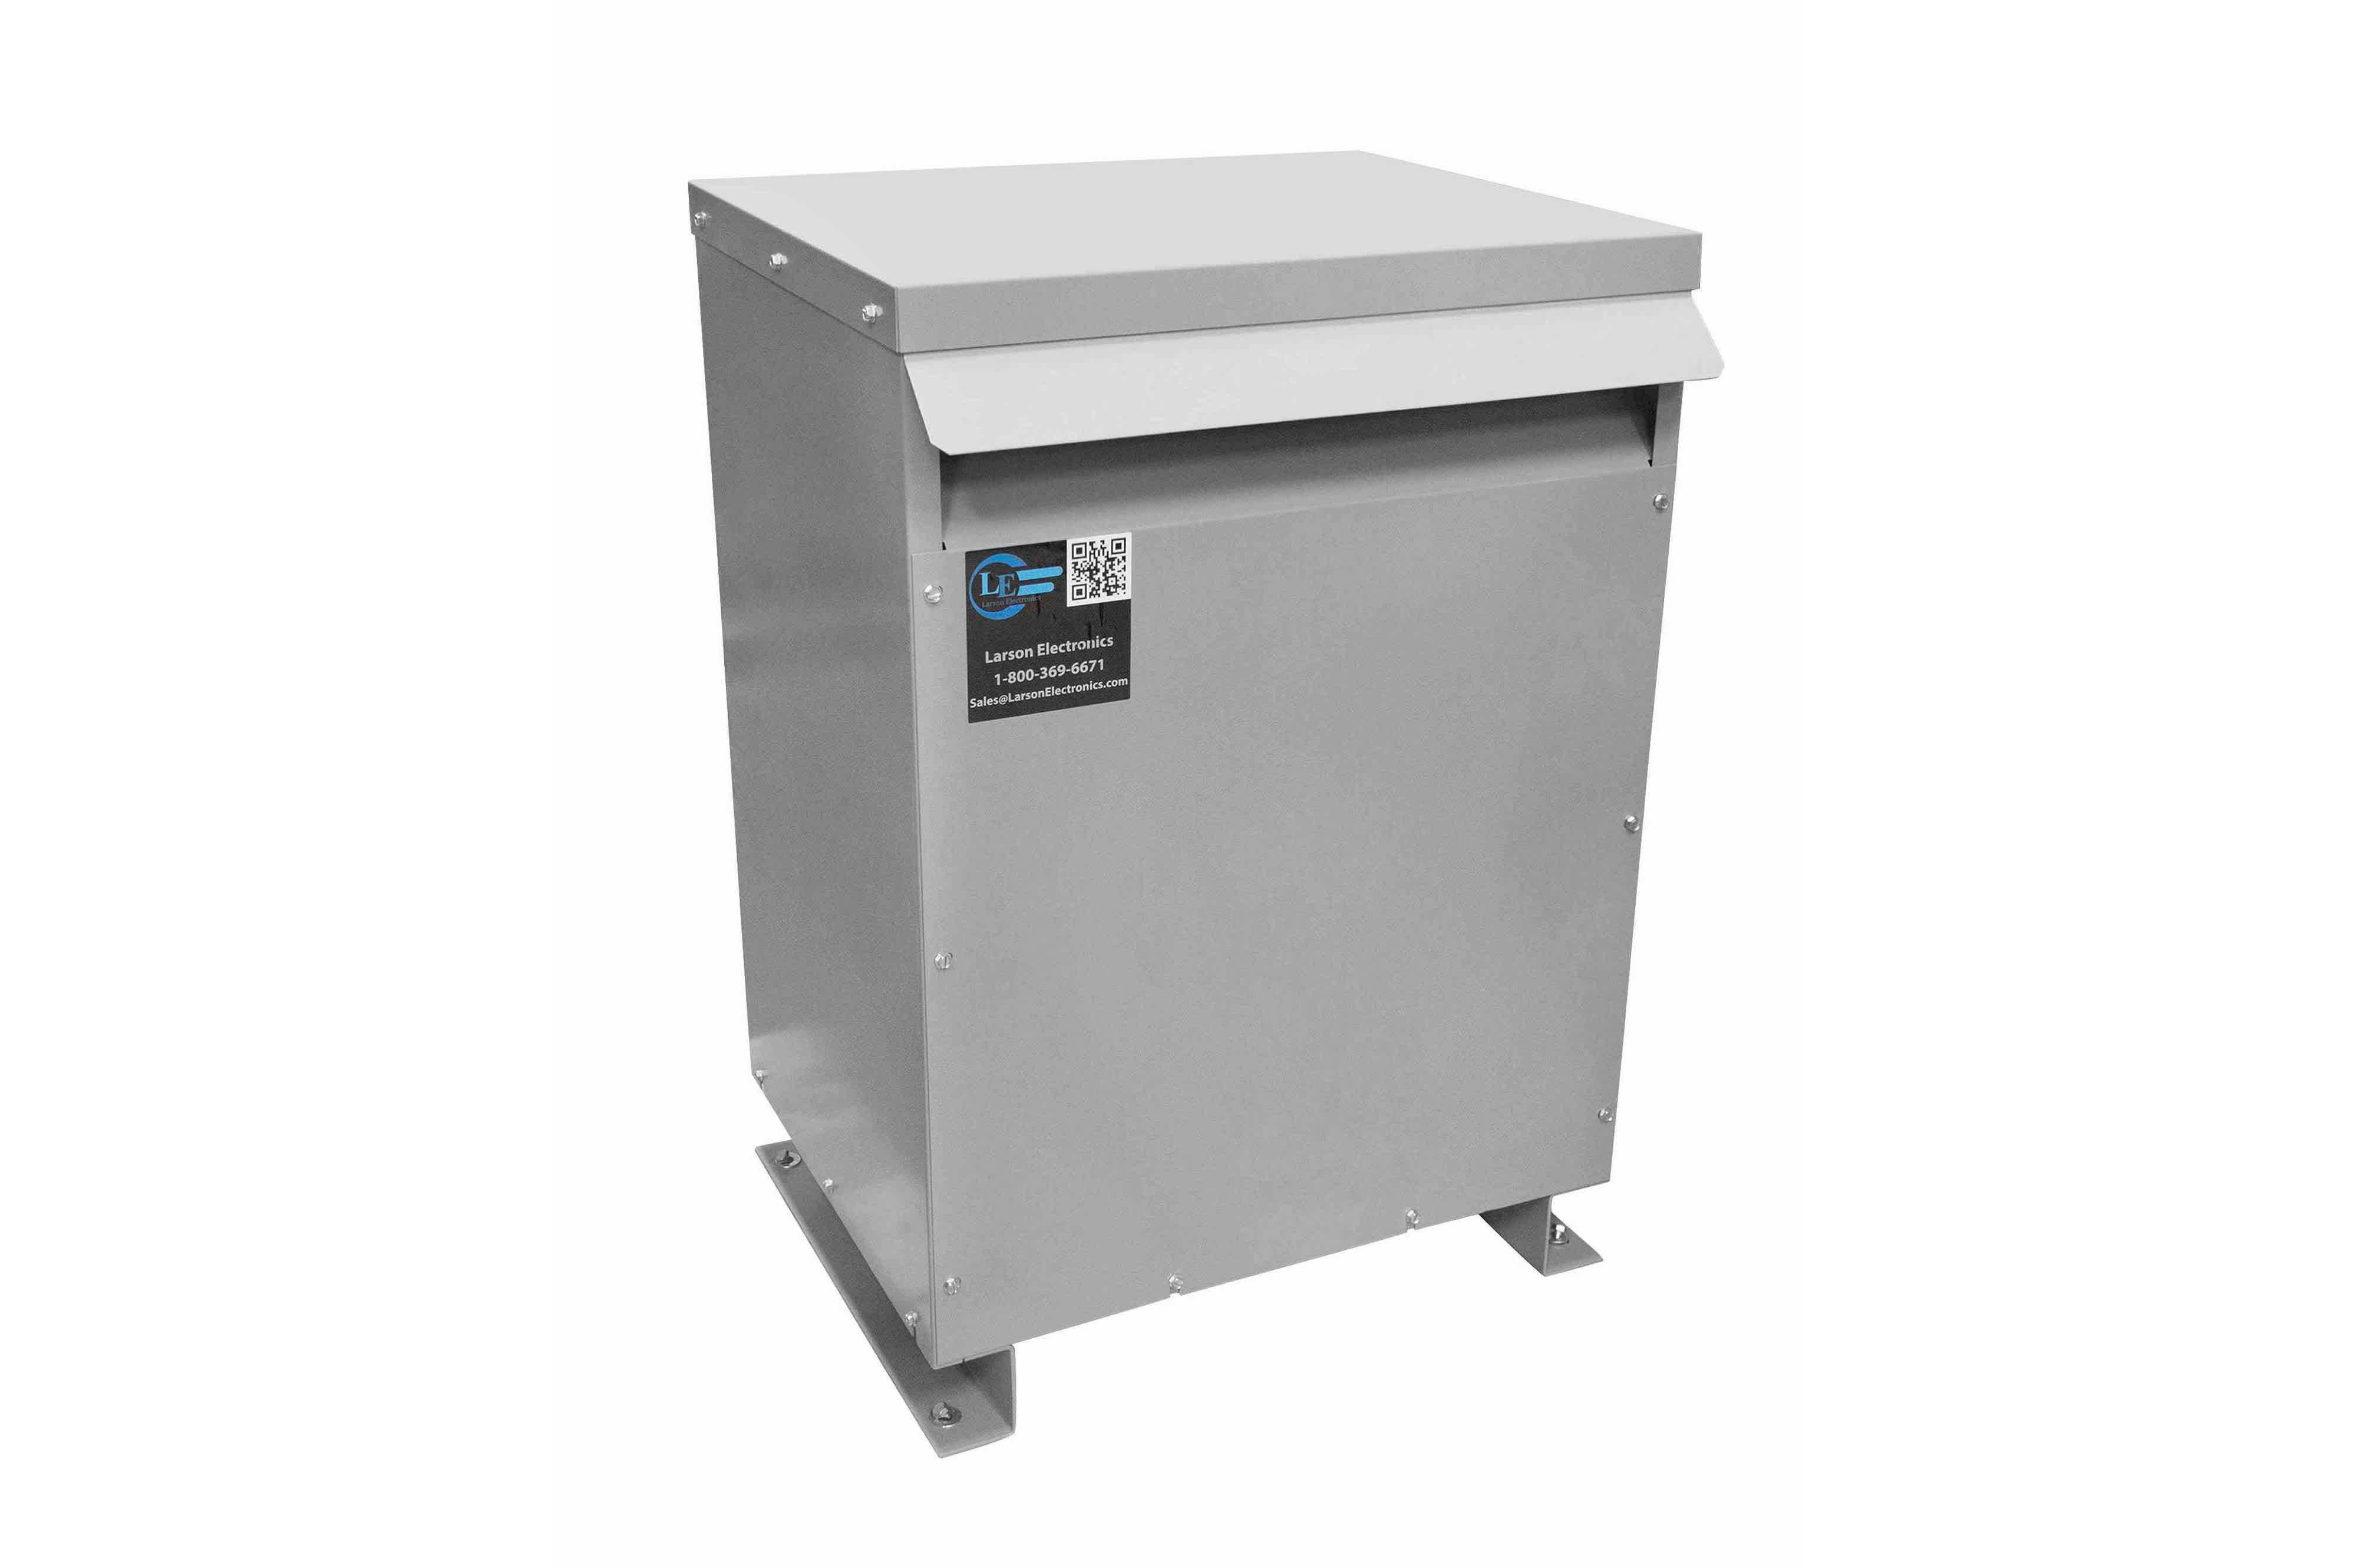 30 kVA 3PH Isolation Transformer, 240V Wye Primary, 208V Delta Secondary, N3R, Ventilated, 60 Hz